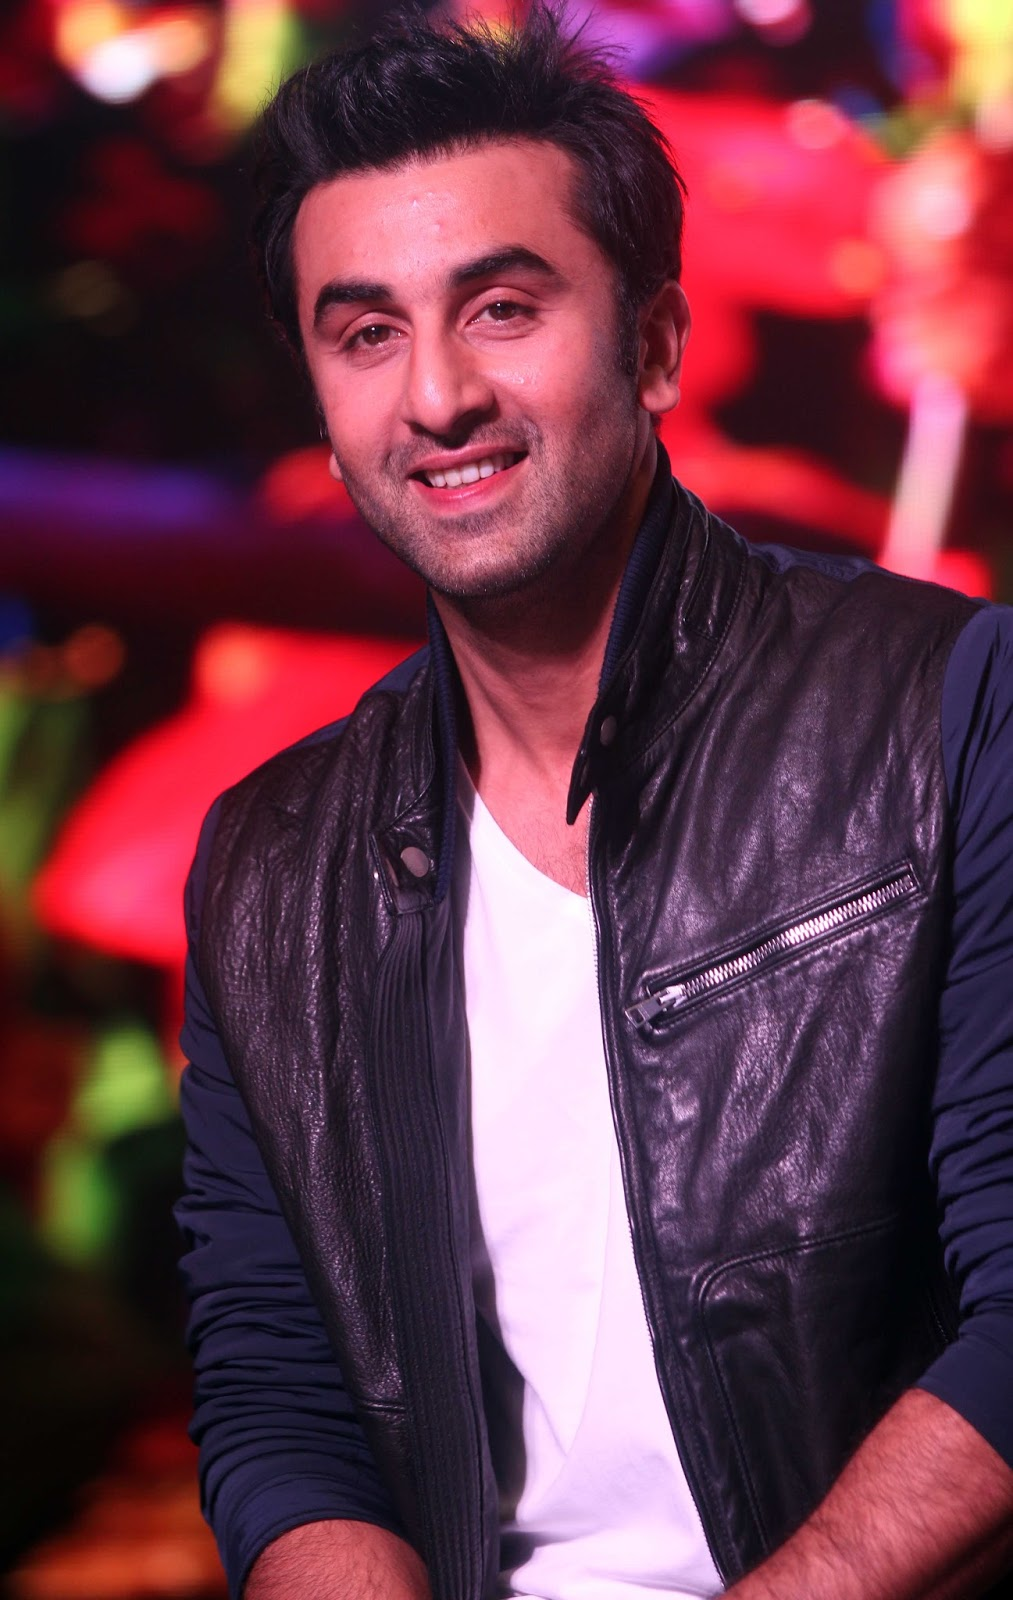 Ranbir Kapoor at Besharm Movie Song Launch Stills - The ...